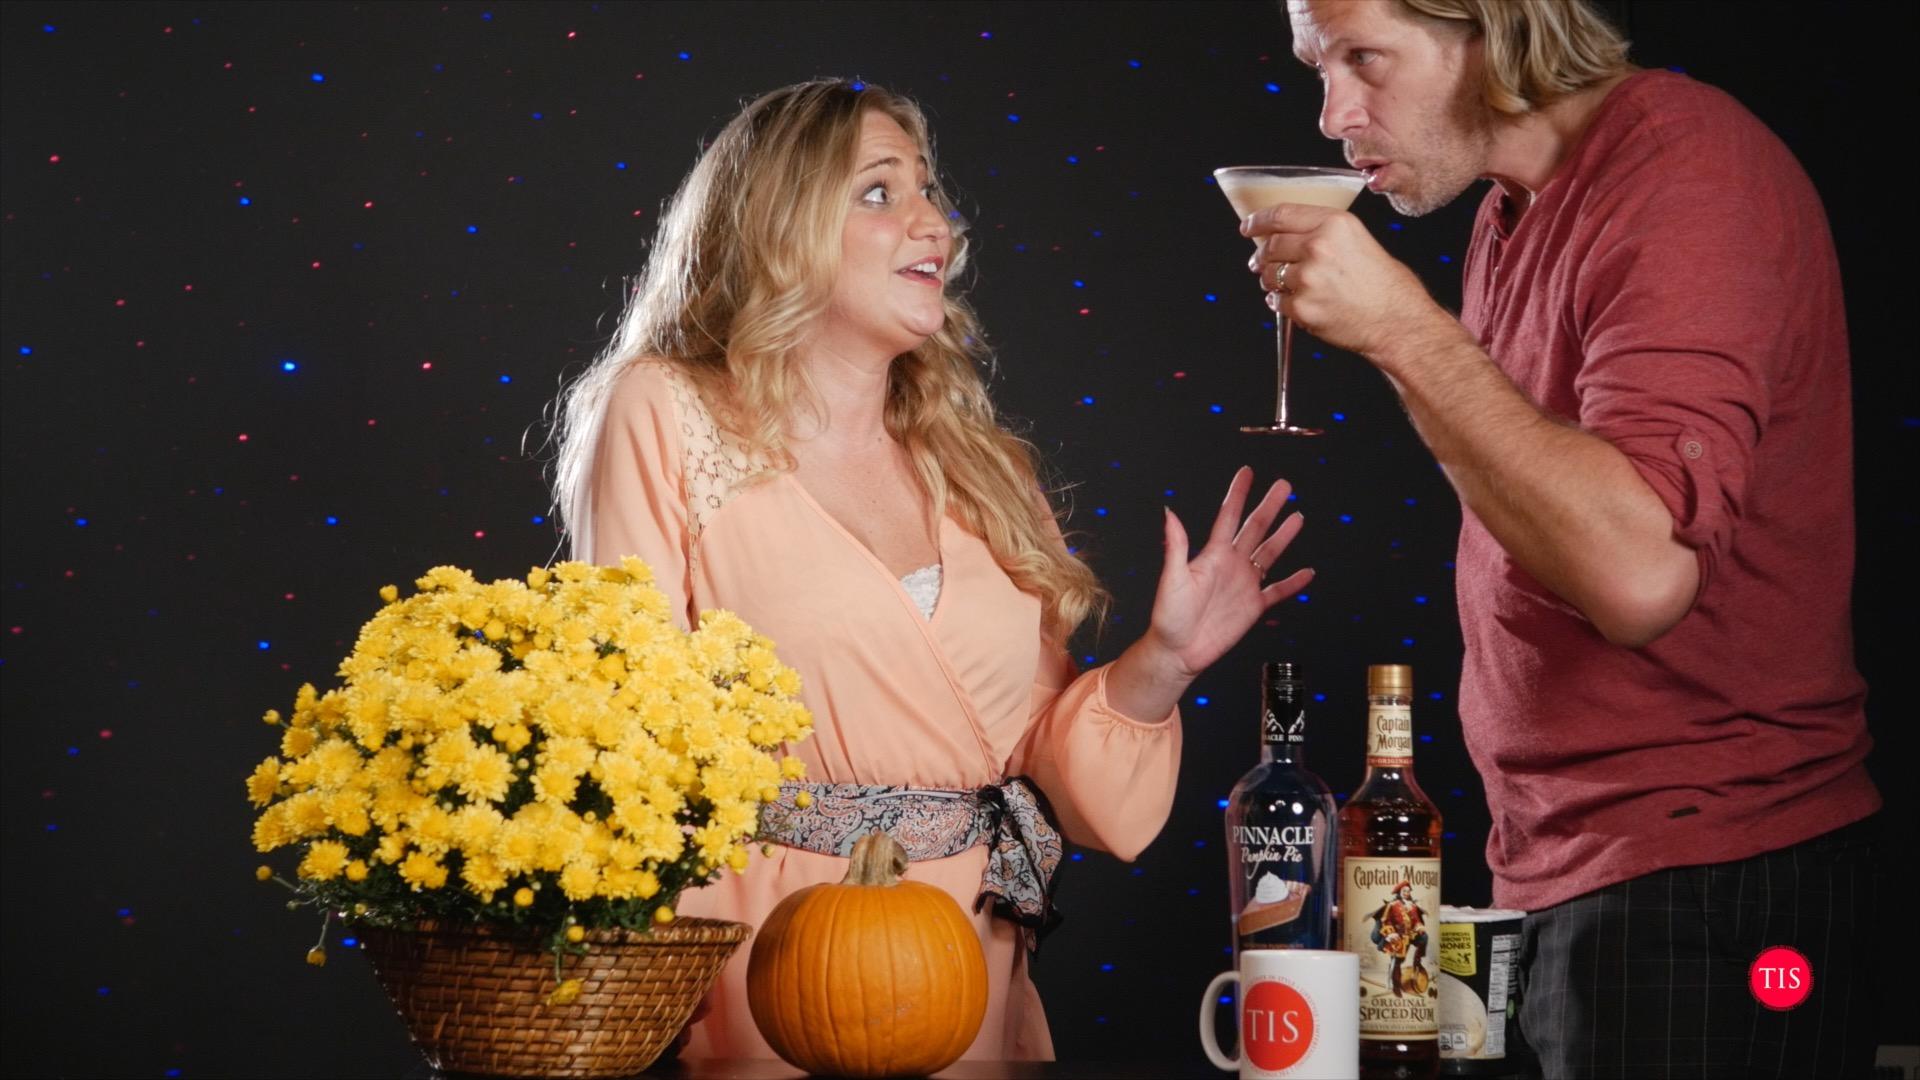 Make sure to try Jennifer's Pumpkin Spice Martini